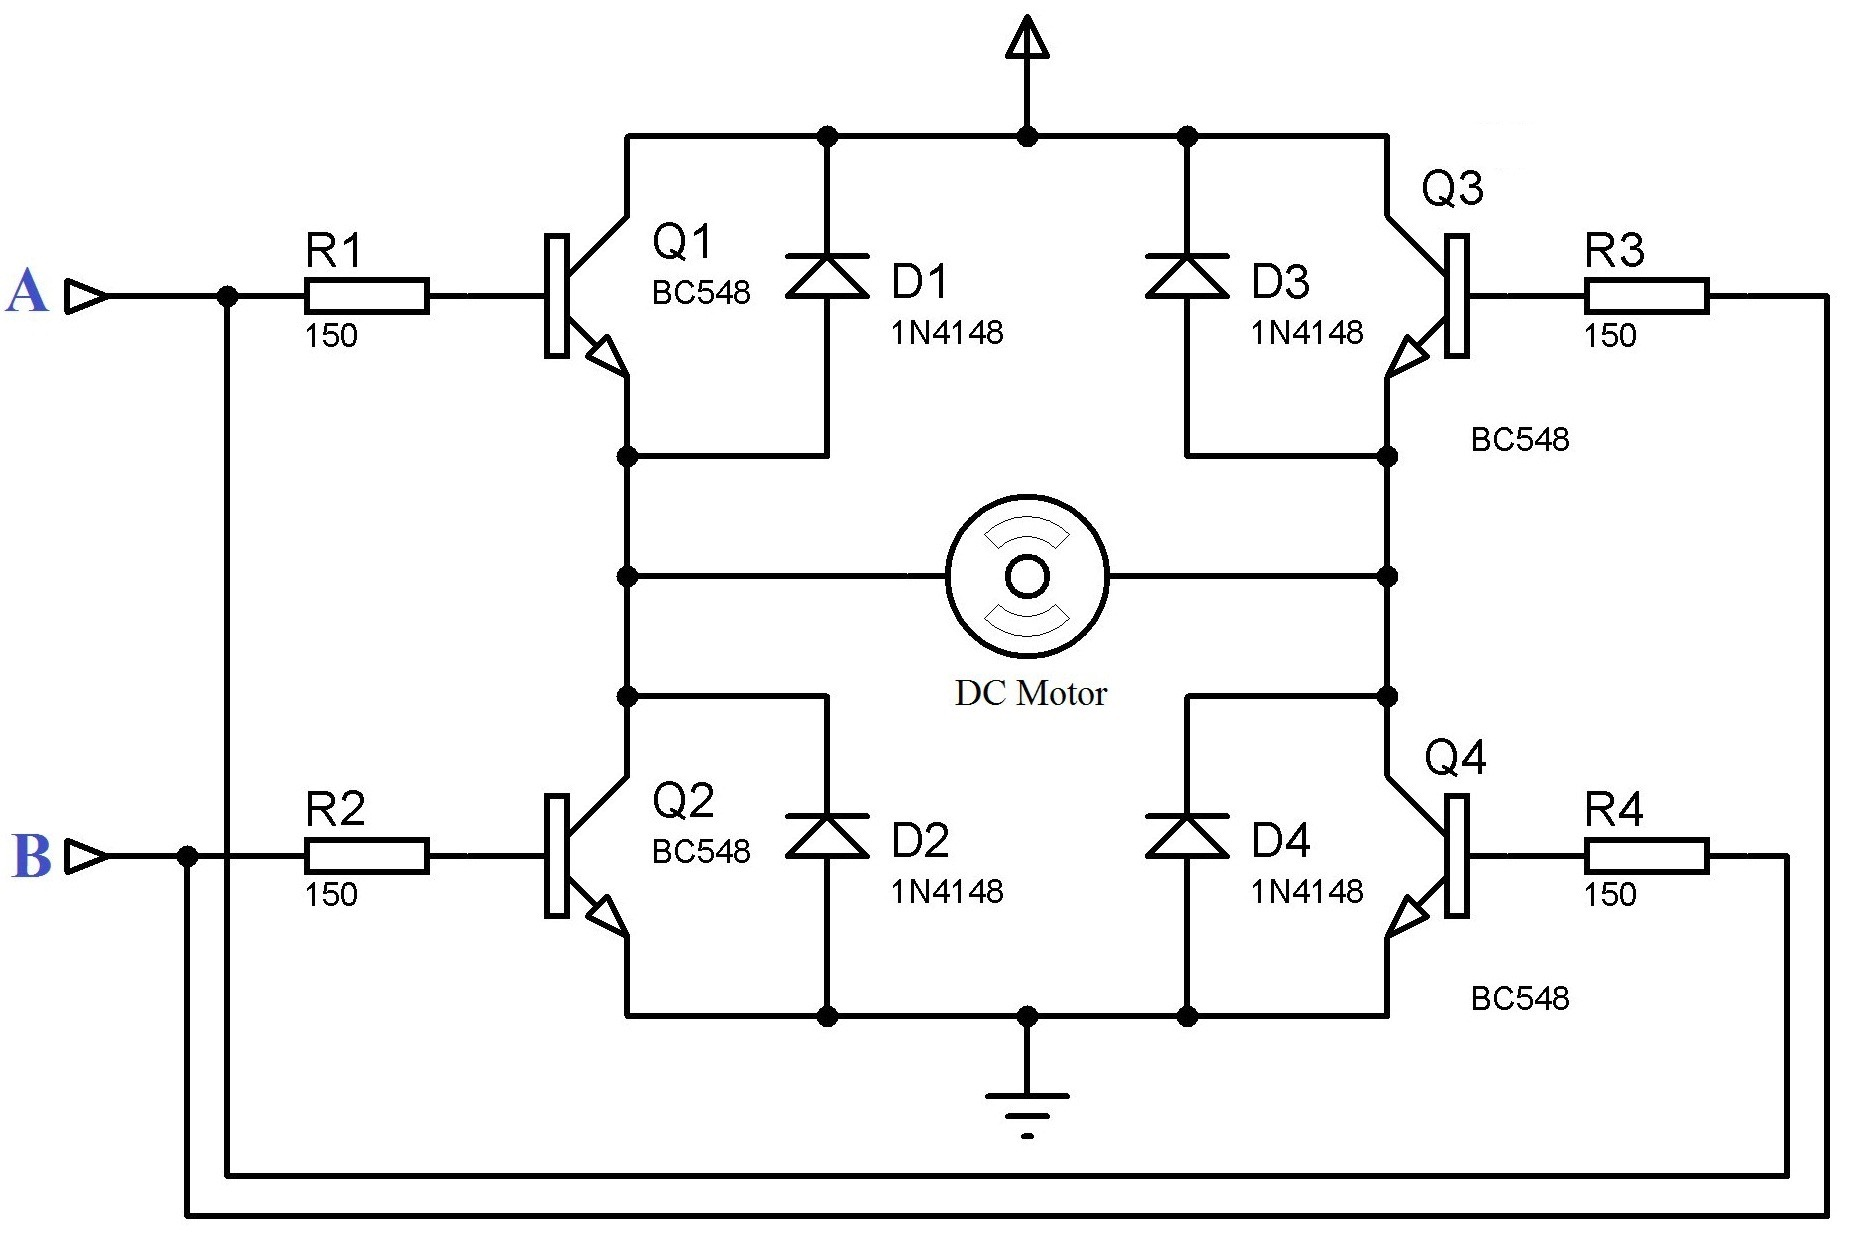 Webaudiohaptics Tutorial On Haptics With Web Audio At The H Bridge Ups Circuit Diagram High Torque And Servo Motors